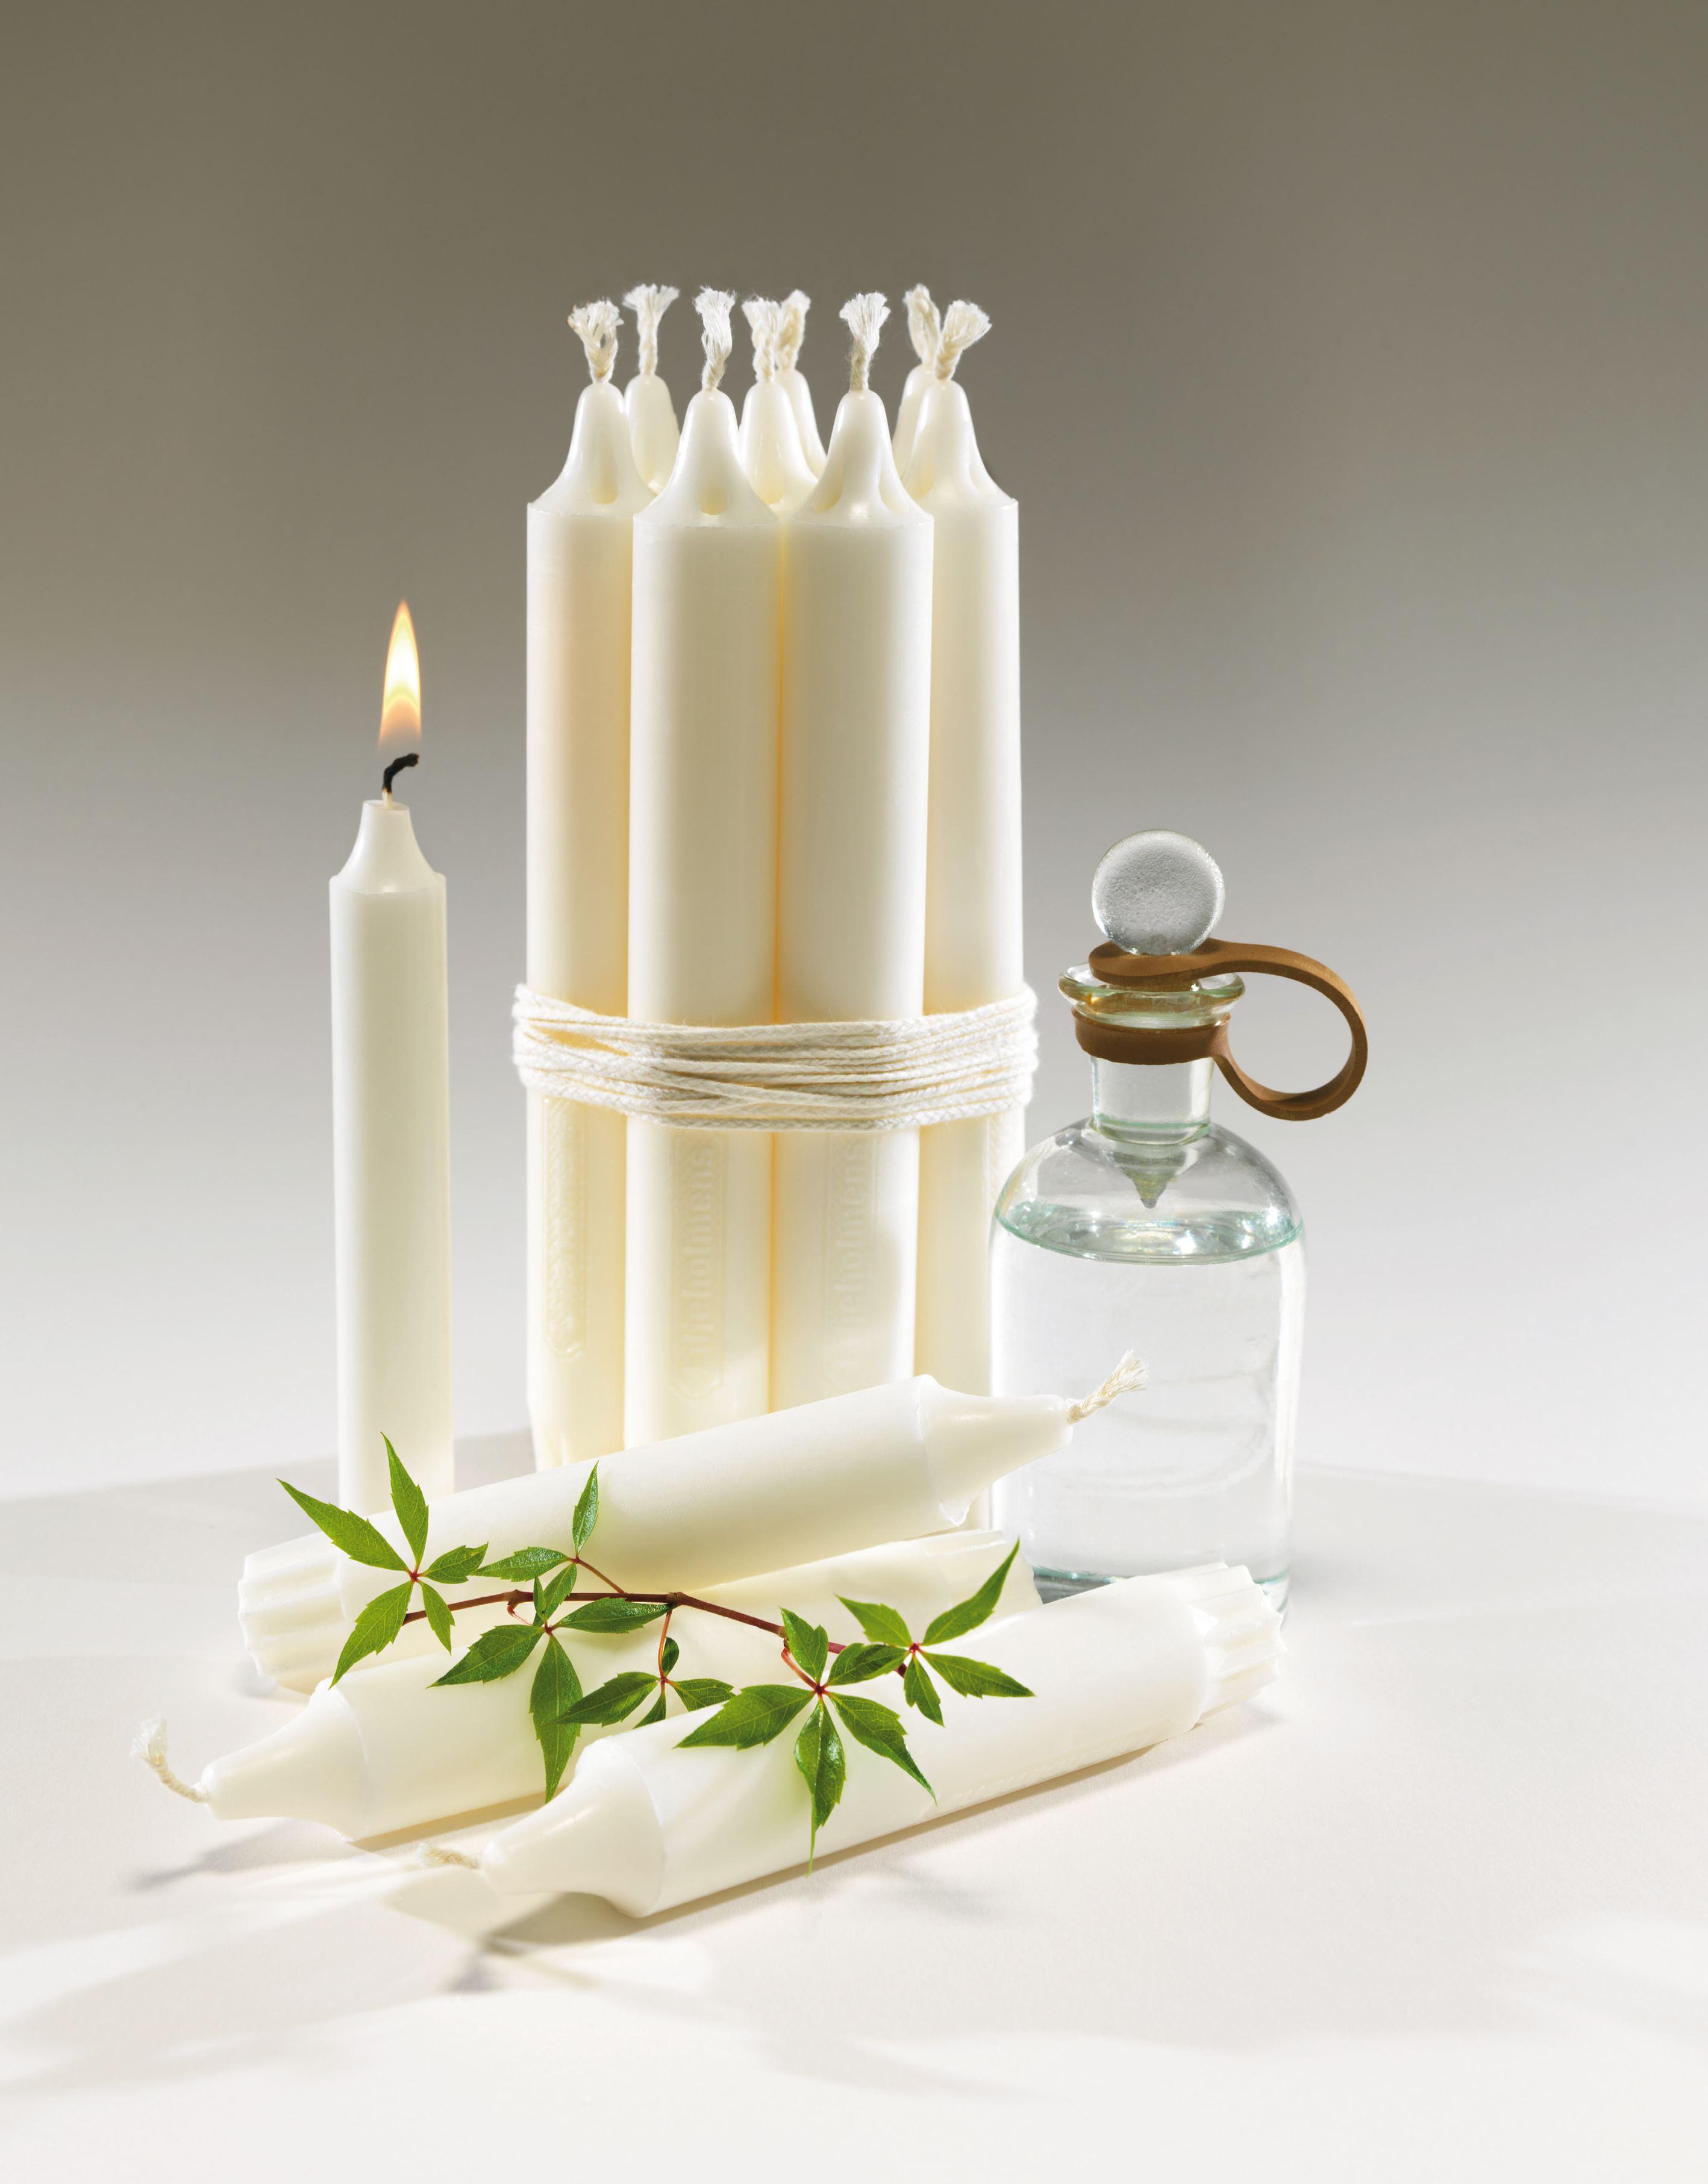 Liljeholmens Candlelight Factory